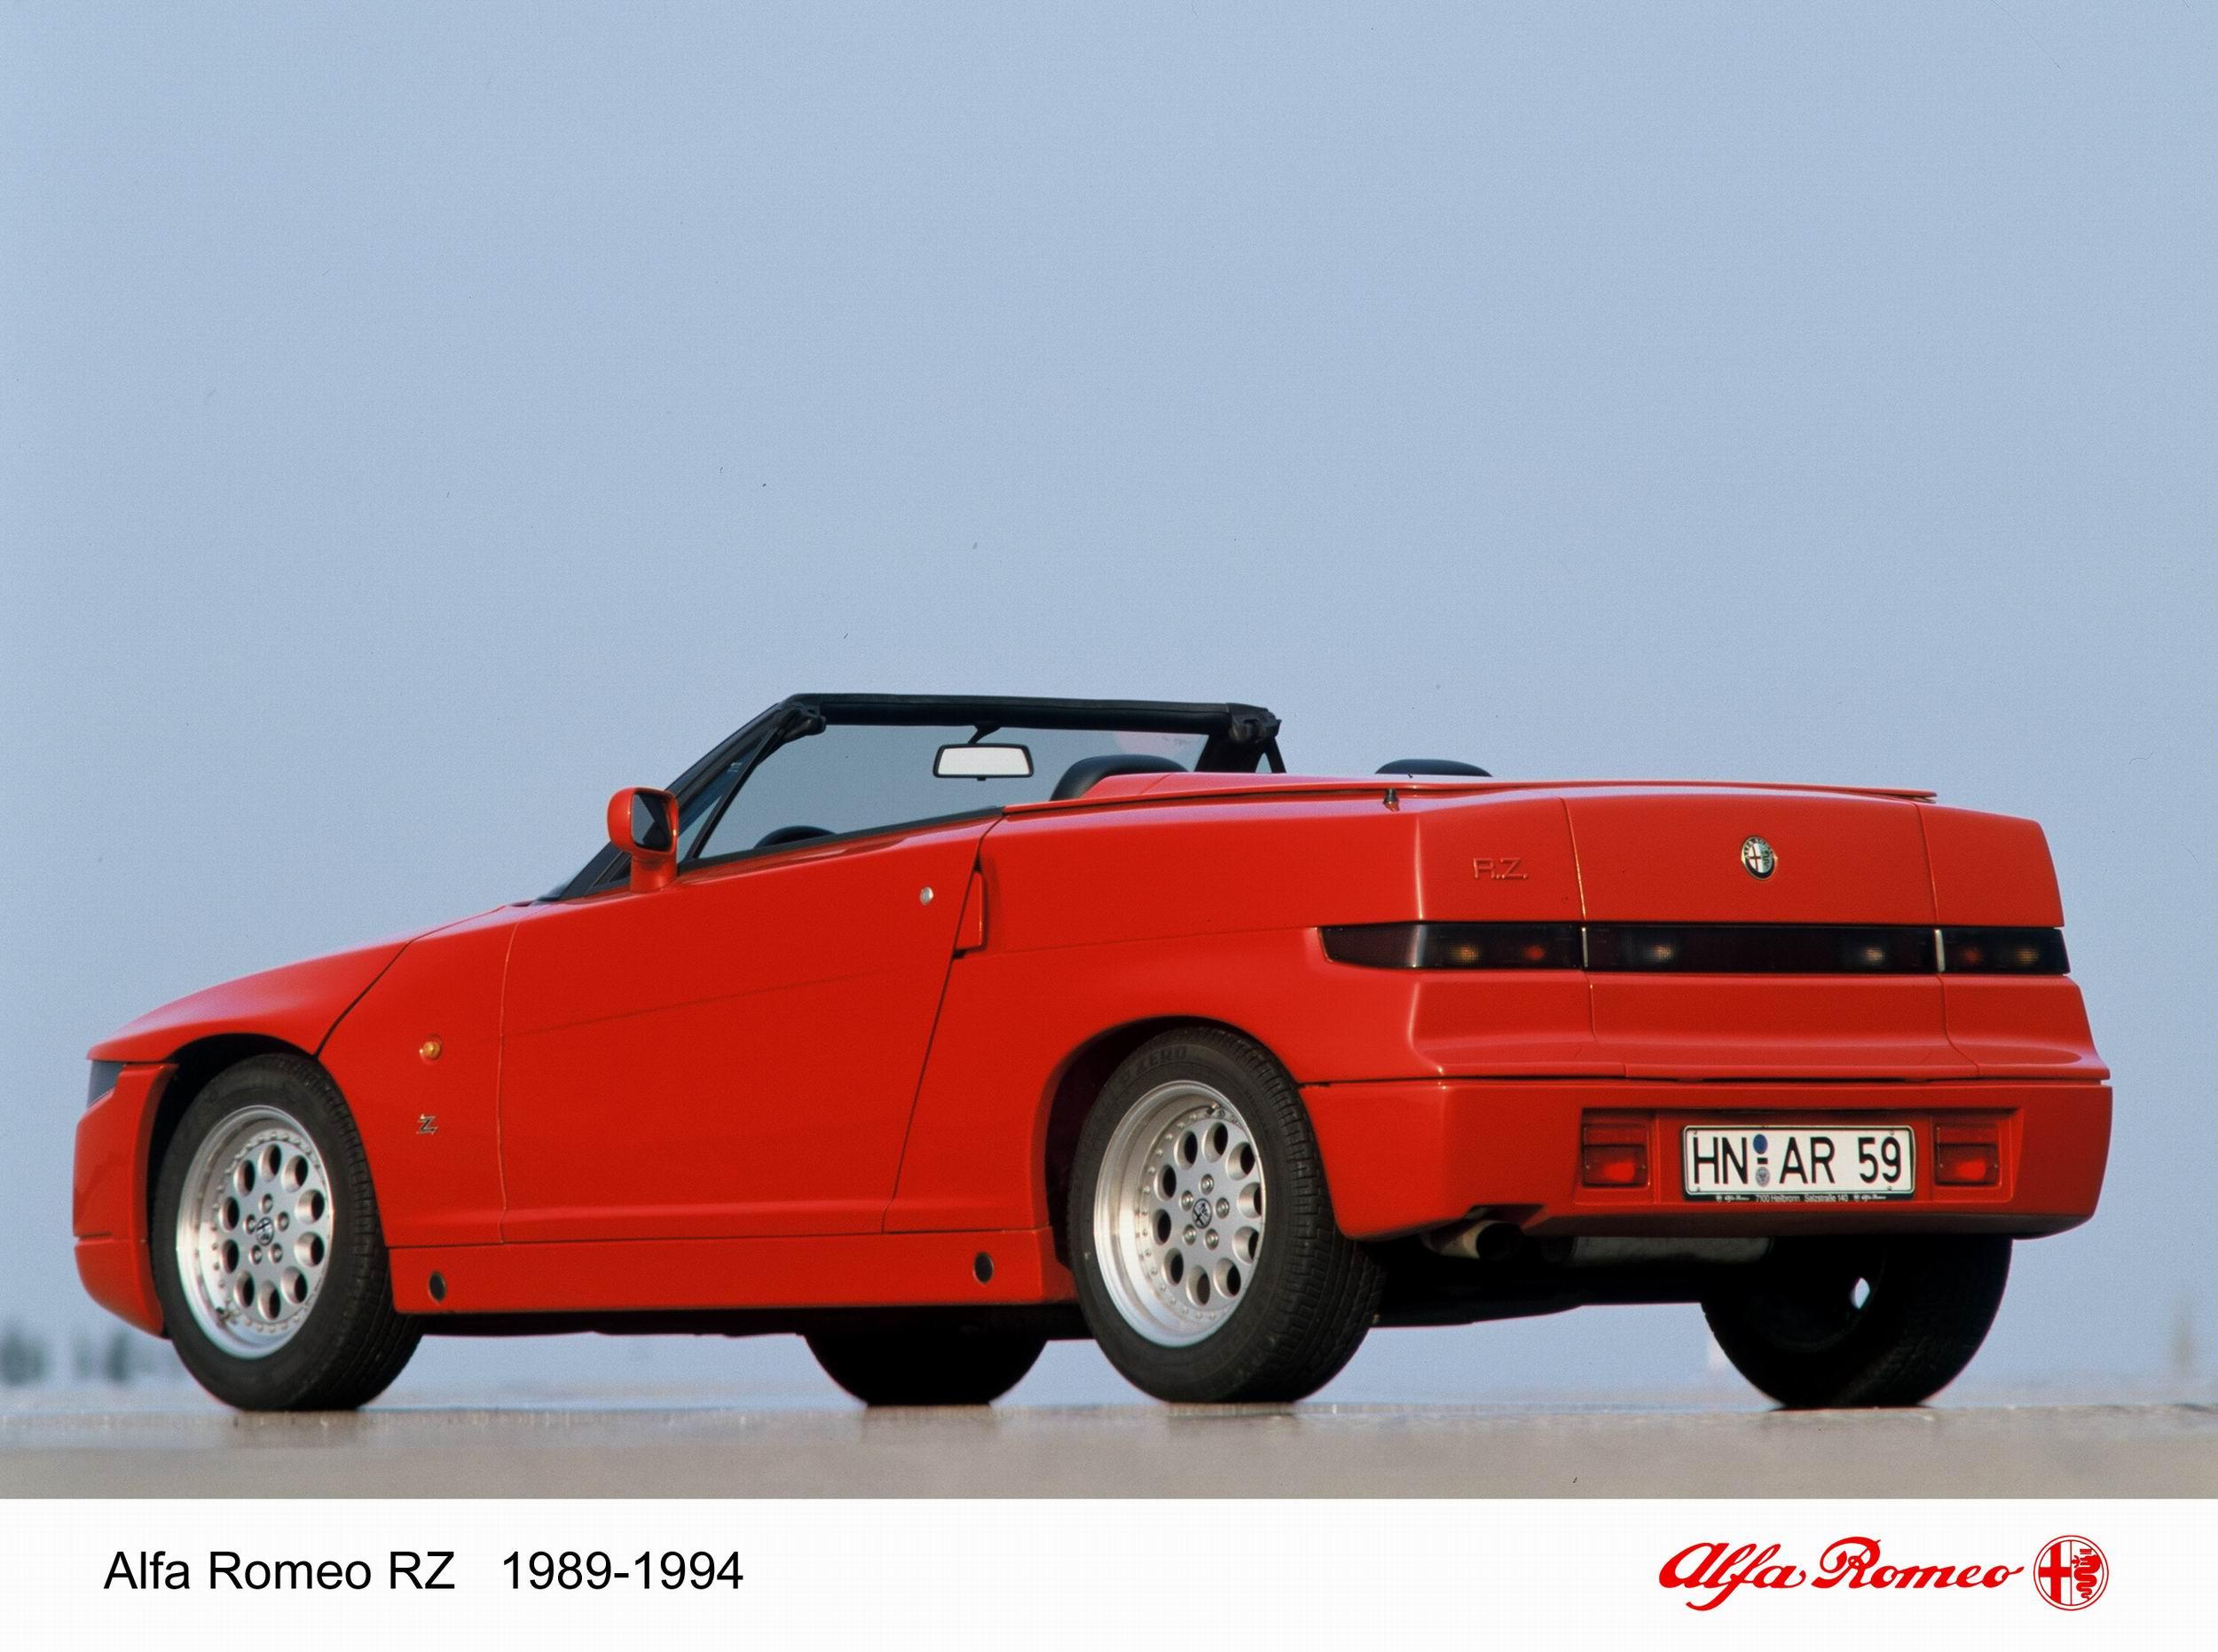 1992 Alfa Romeo Rz Zagato Studios 94 Accord Fuel Pump Relay Location